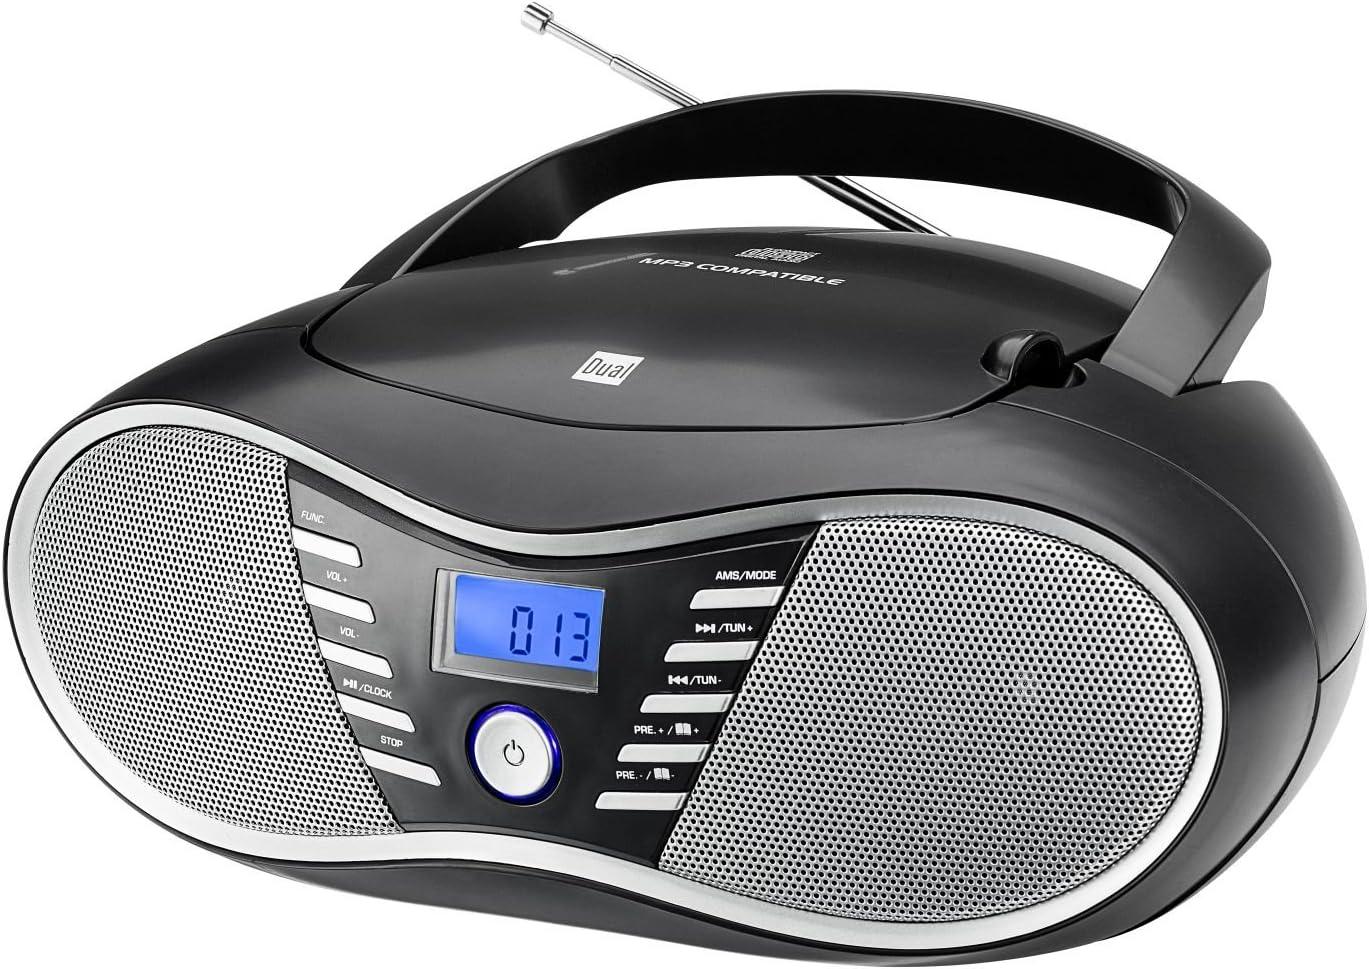 Dual P 60 BT Portable Boombox UKW-Radio, CD-Player, Bluetooth f/ür Audiostreaming, USB-Anschluss Rot